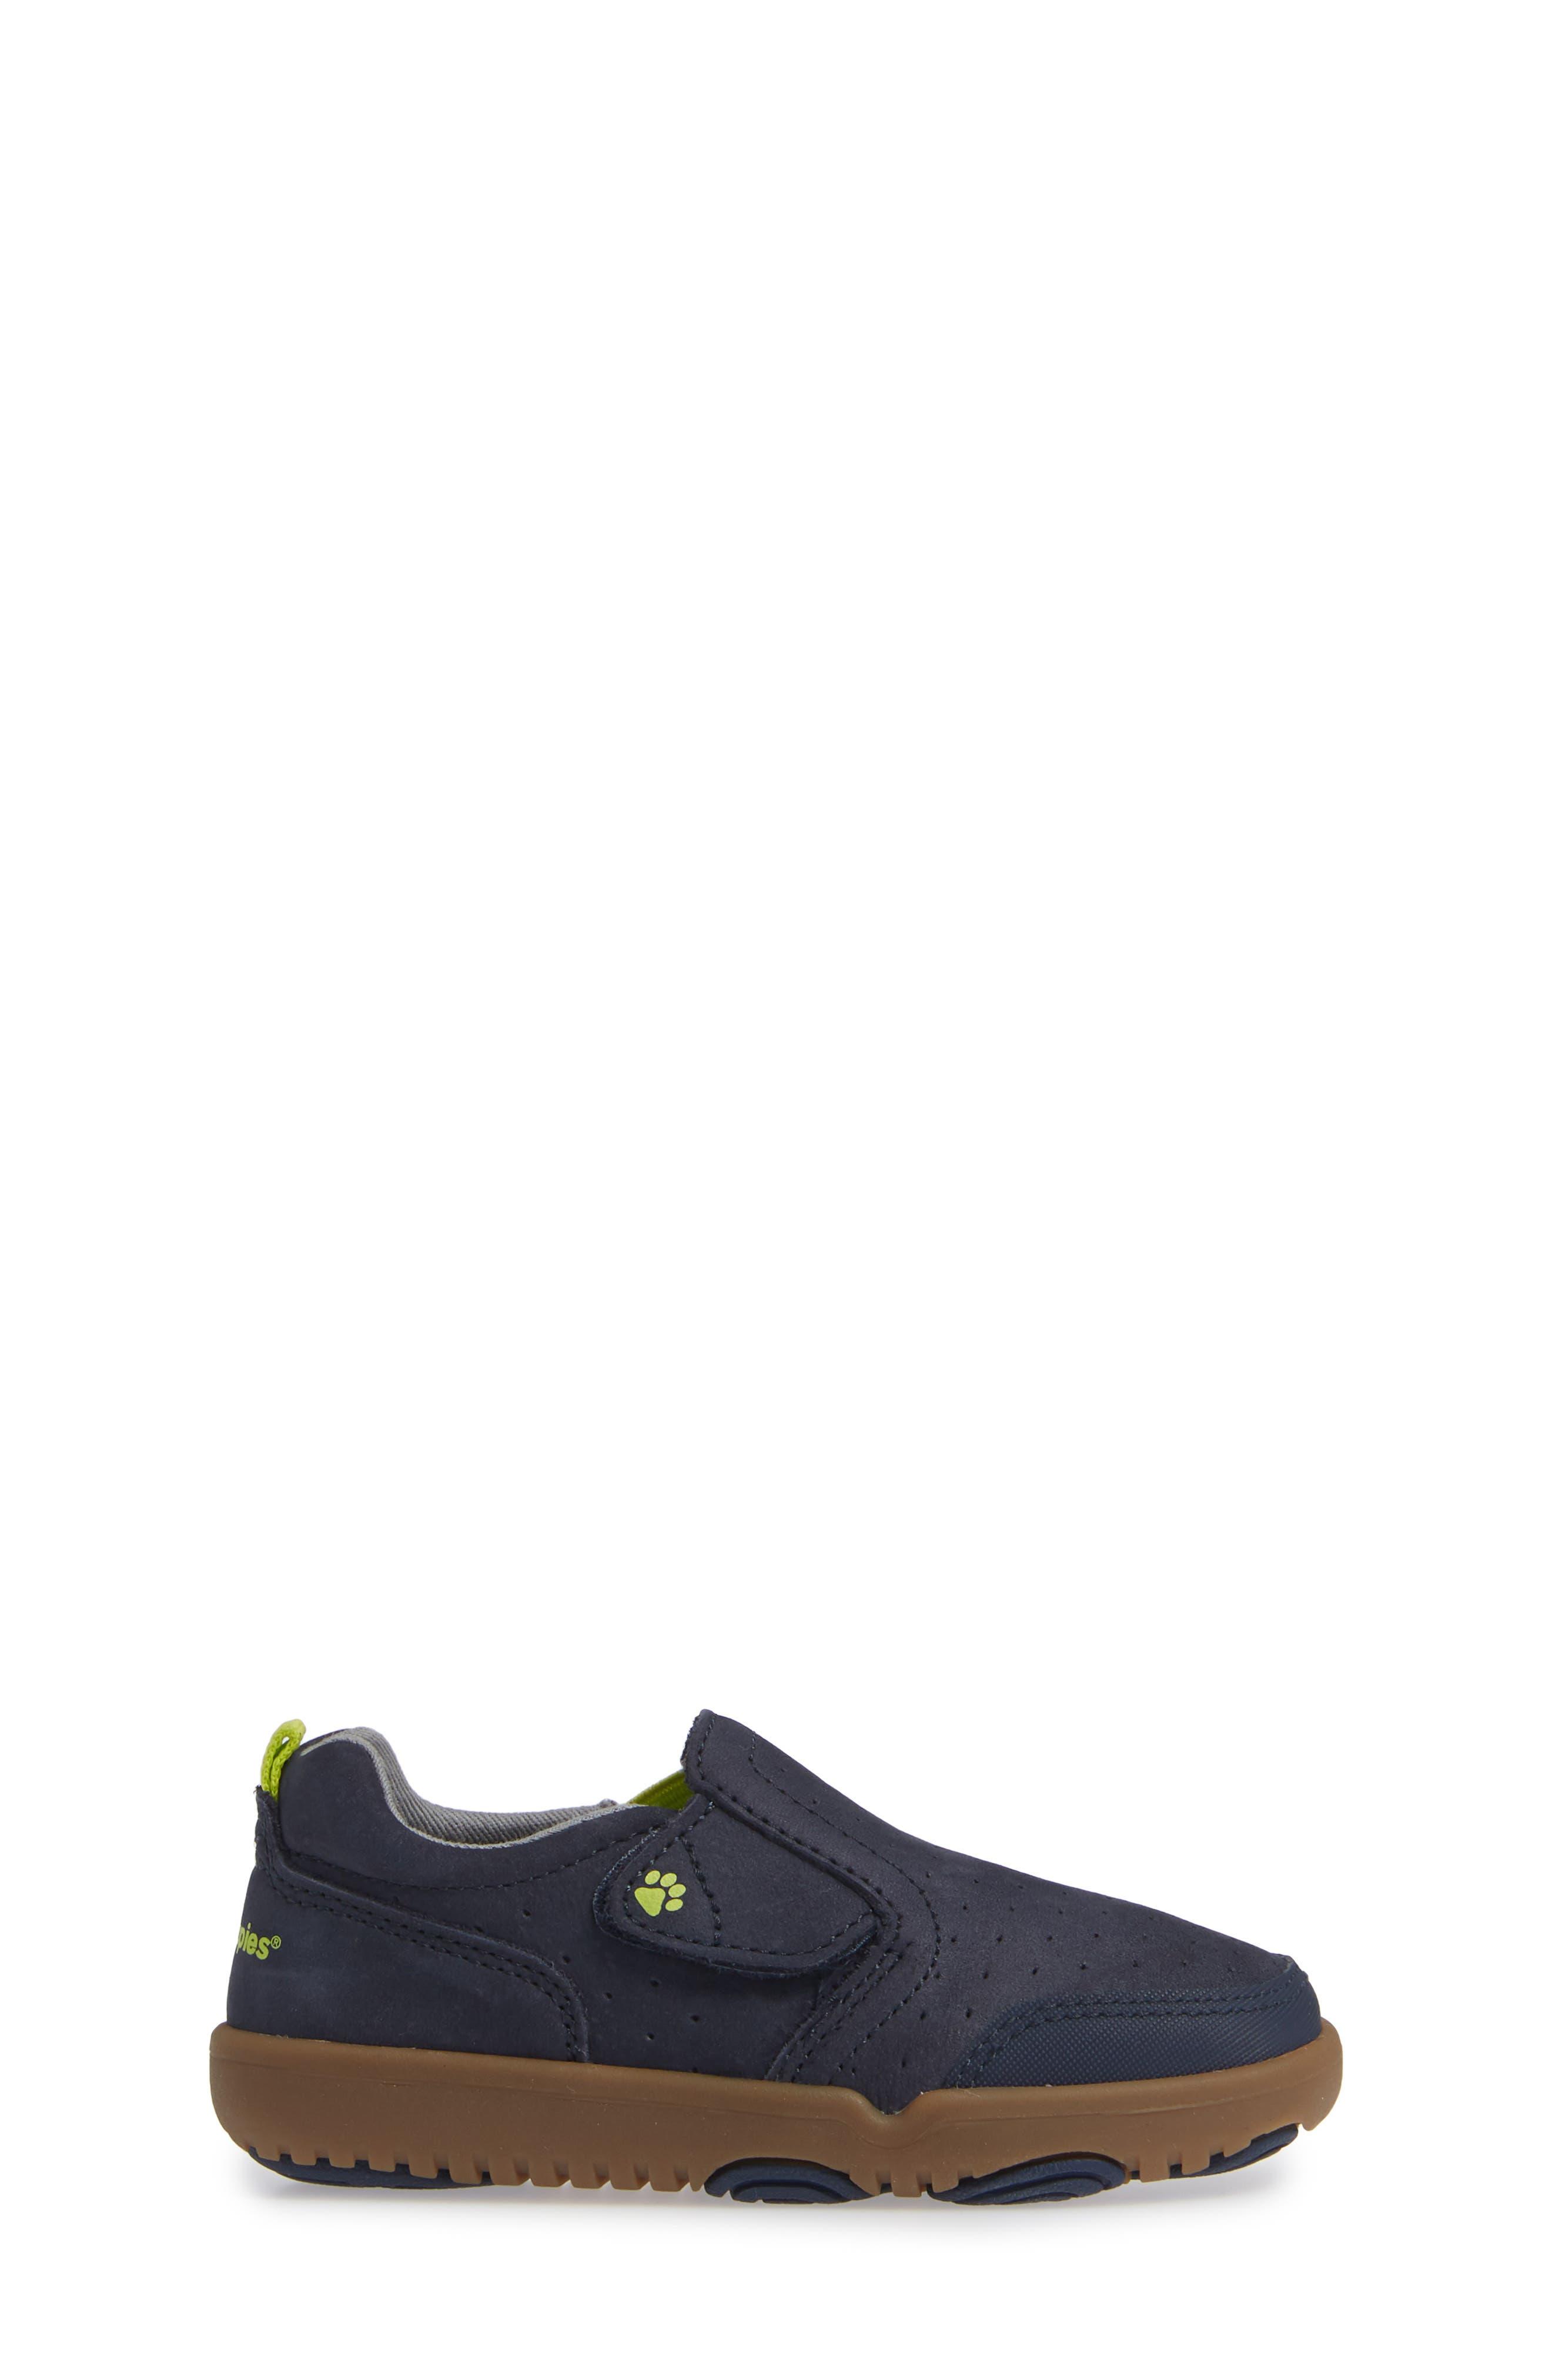 Marley Sneaker,                             Alternate thumbnail 3, color,                             NAVY